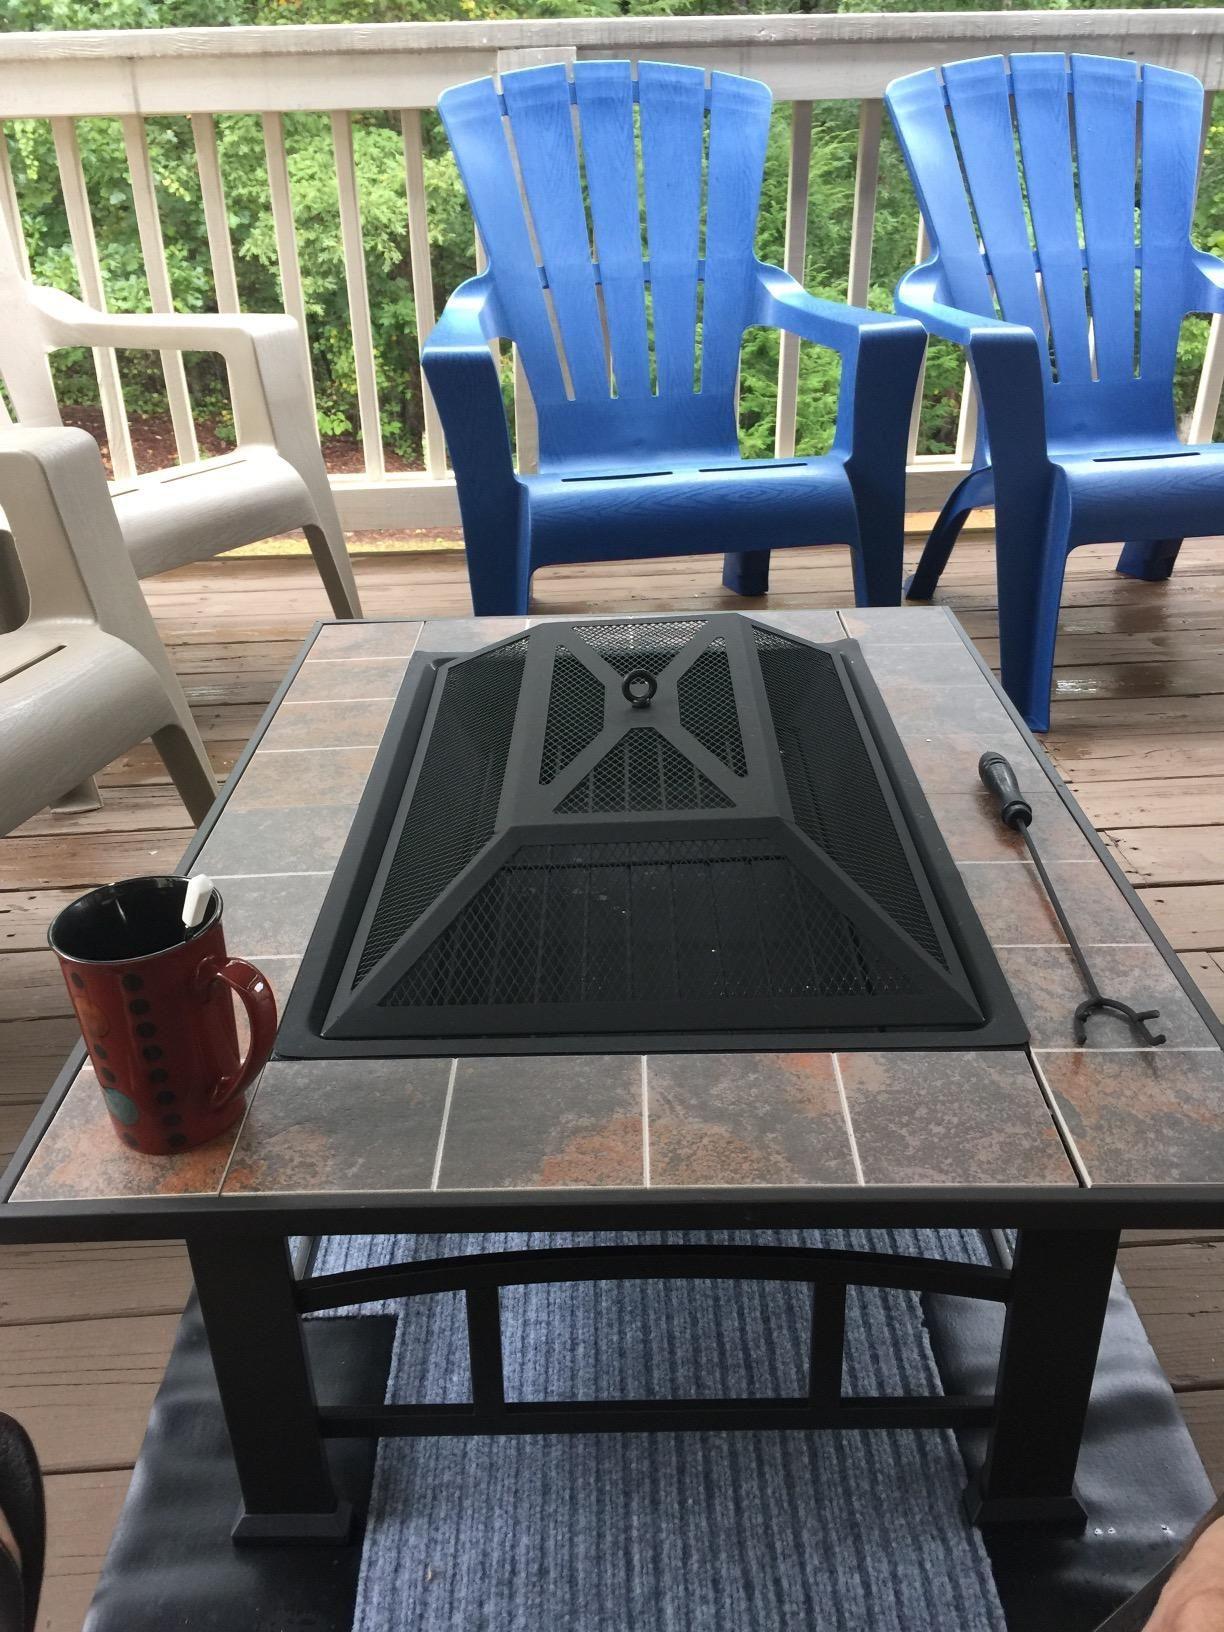 Amazon.com : Axxonn Outdoor Rectangular Ceramic Tile Top Fire Pit, Brownish Bronze : Patio, Lawn & Garden